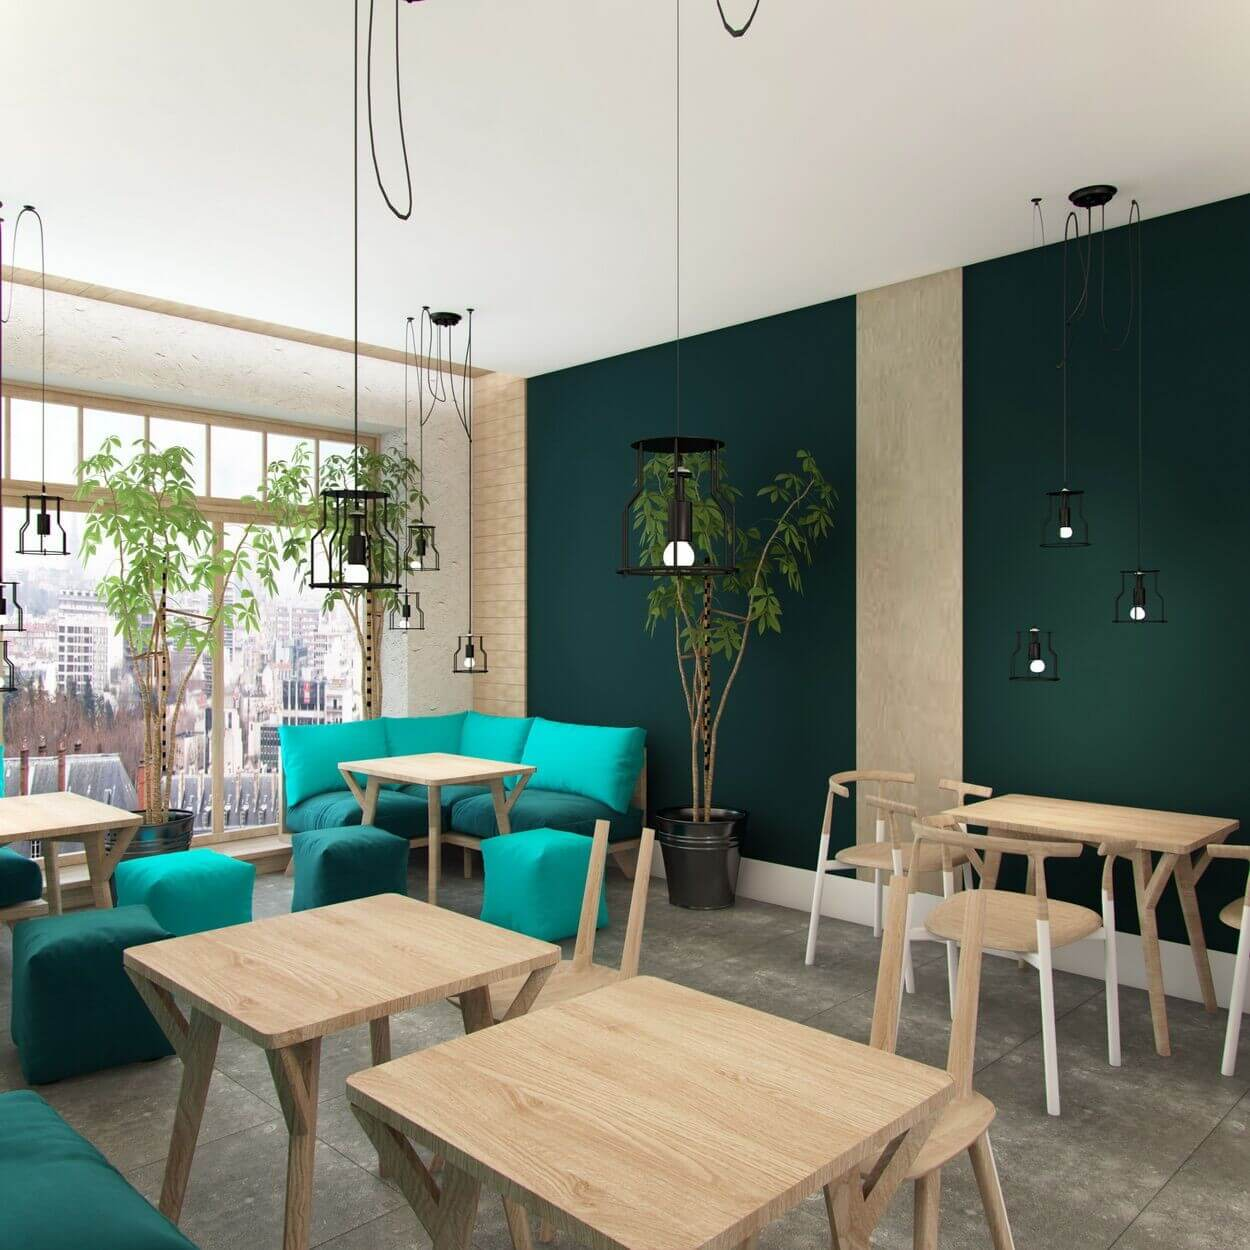 дизайн проект кафе милк поинт